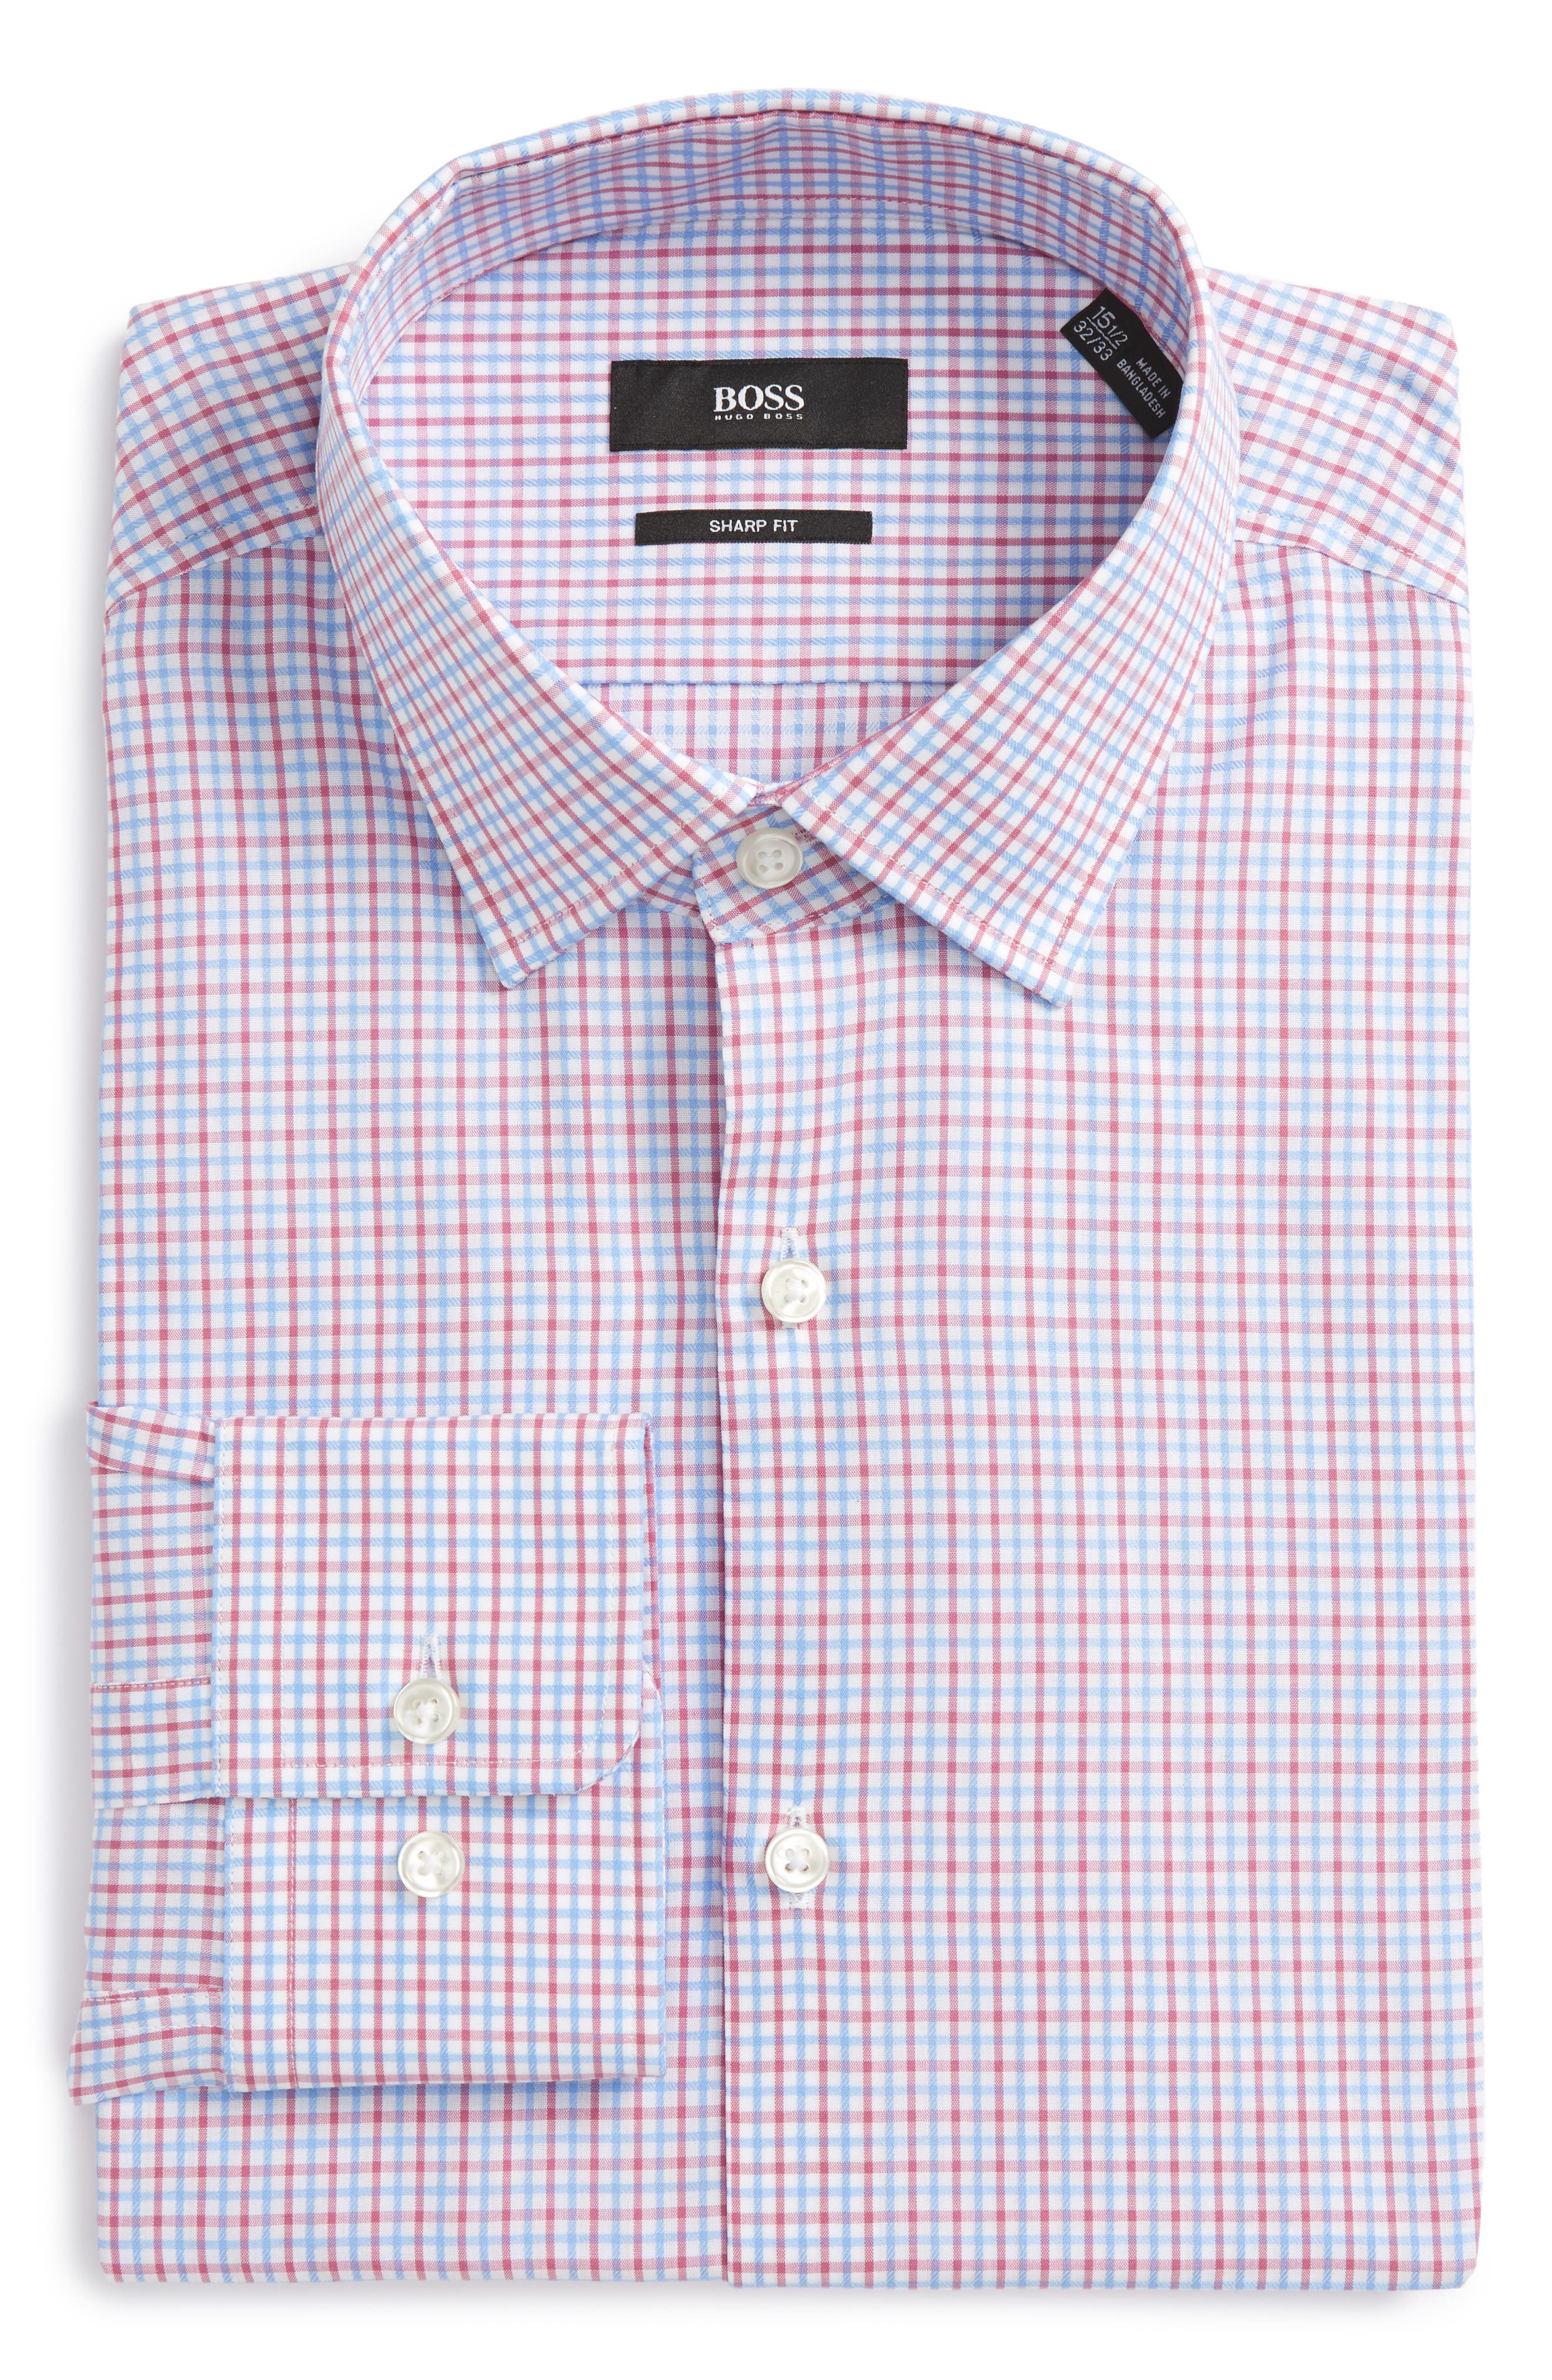 Alternate Image 1 Selected - BOSS Marley Sharp Fit Check Dress Shirt